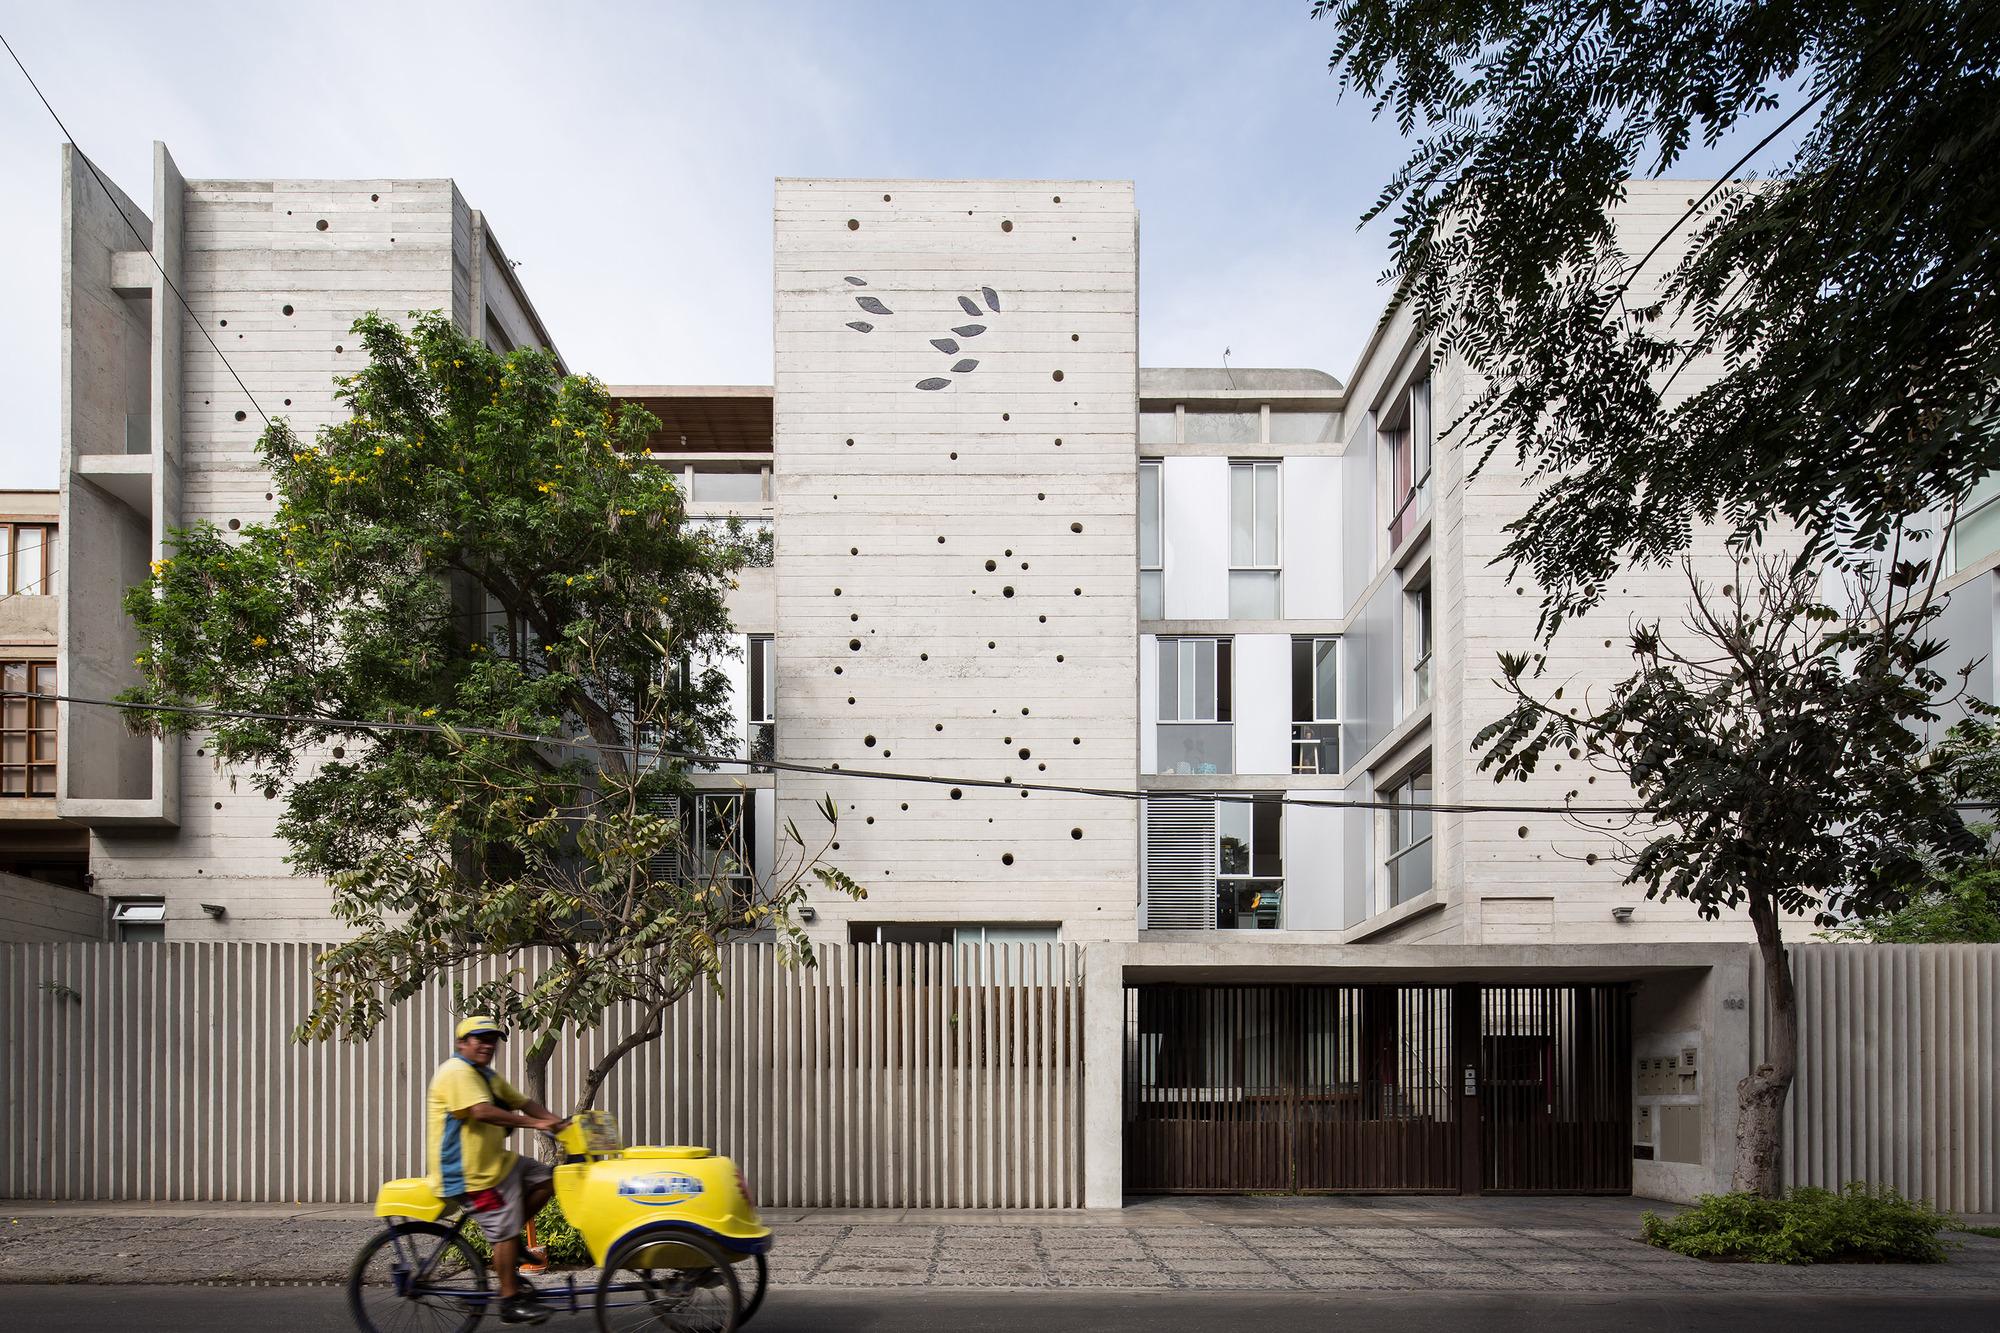 Edificio mg barclay crousse plataforma arquitectura for Arquitectura departamentos modernos